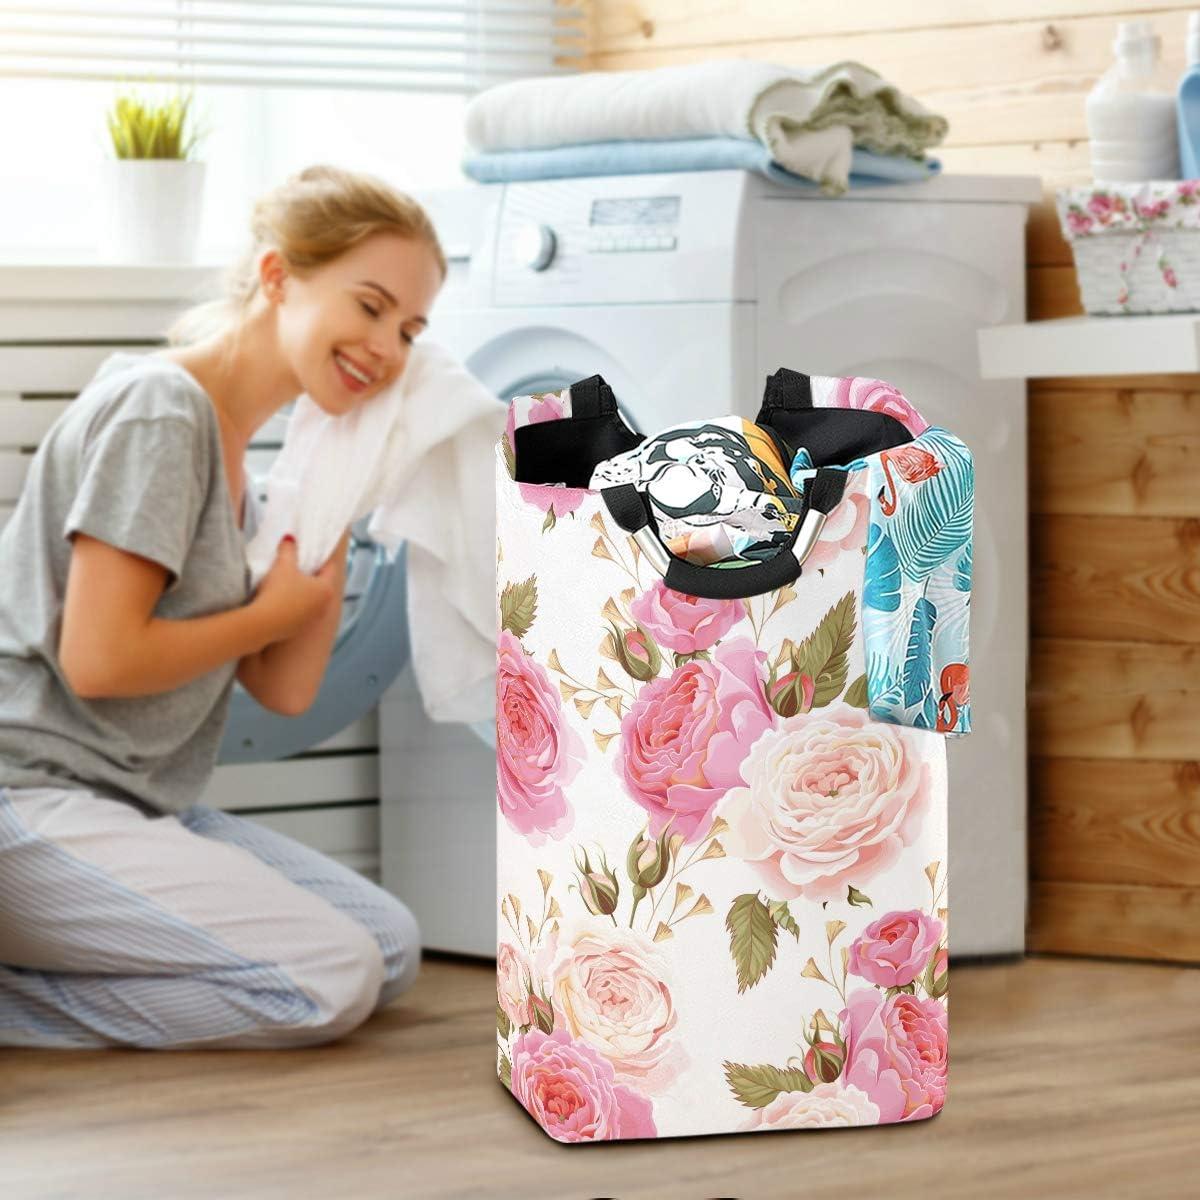 Floral Flower Rose Pink Laundry Basket Washing Clothes Hamper Collapsible Storage Bin Foldable Shopping Bag Toy Book Holder AUUXVA SEULIFE Laundry Hamper